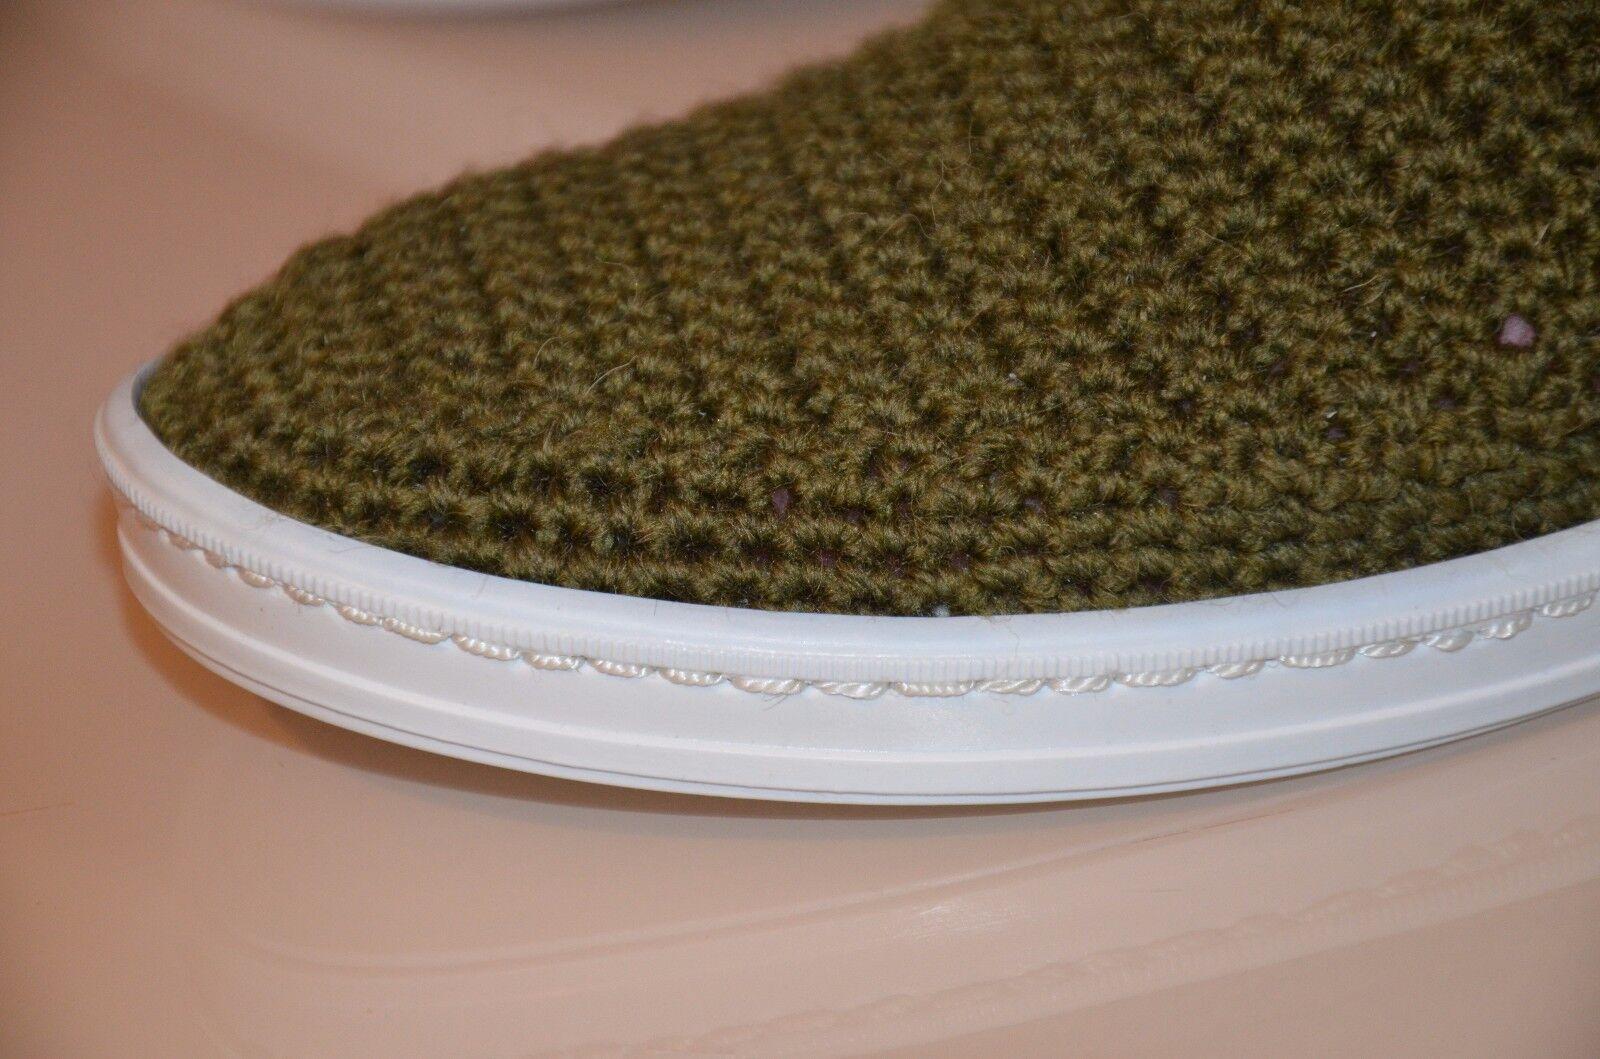 Damens wool crochet Stiefel, slippers, handmade house schuhe, crochet slippers, Stiefel, rubber sole adbb6b